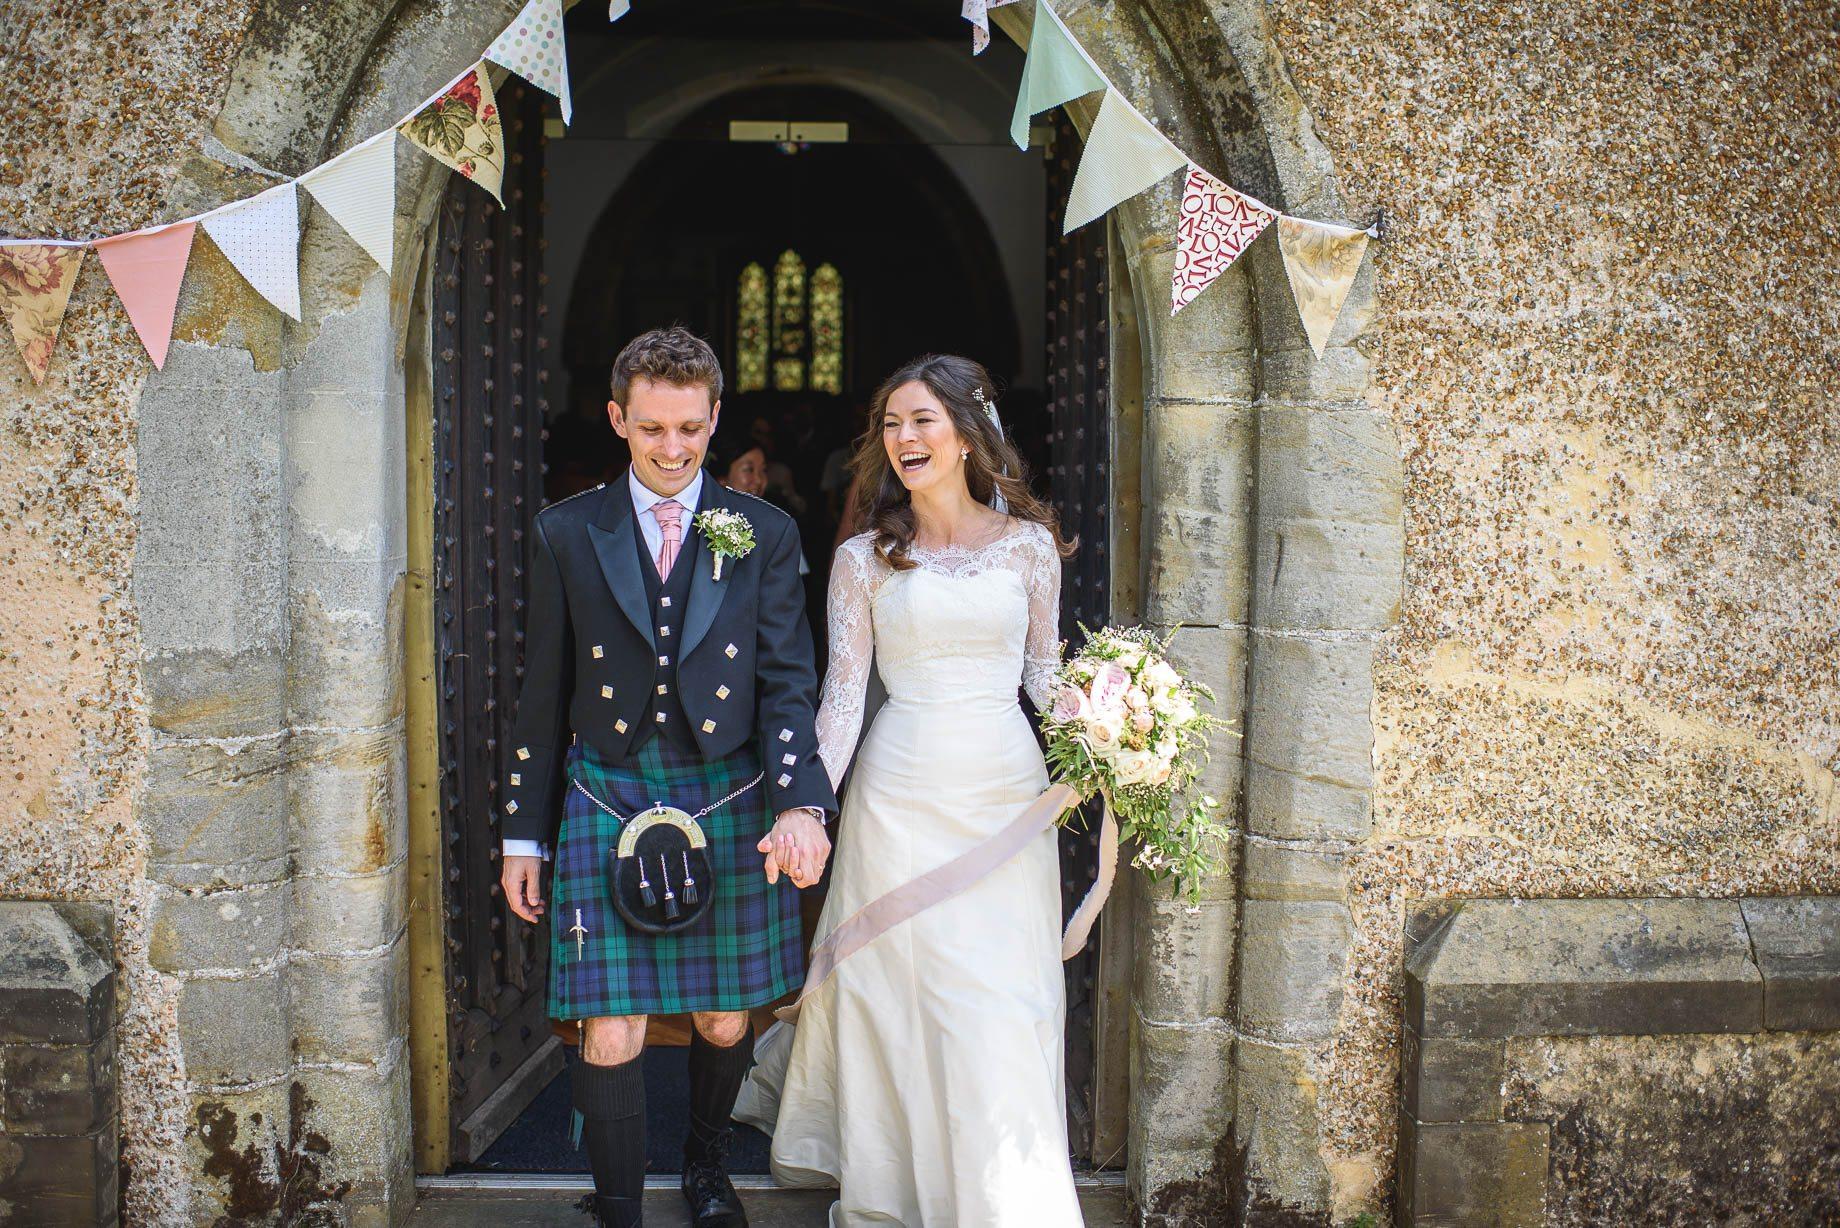 Gildings Barn wedding photography - Sarah and Steve (59 of 190)